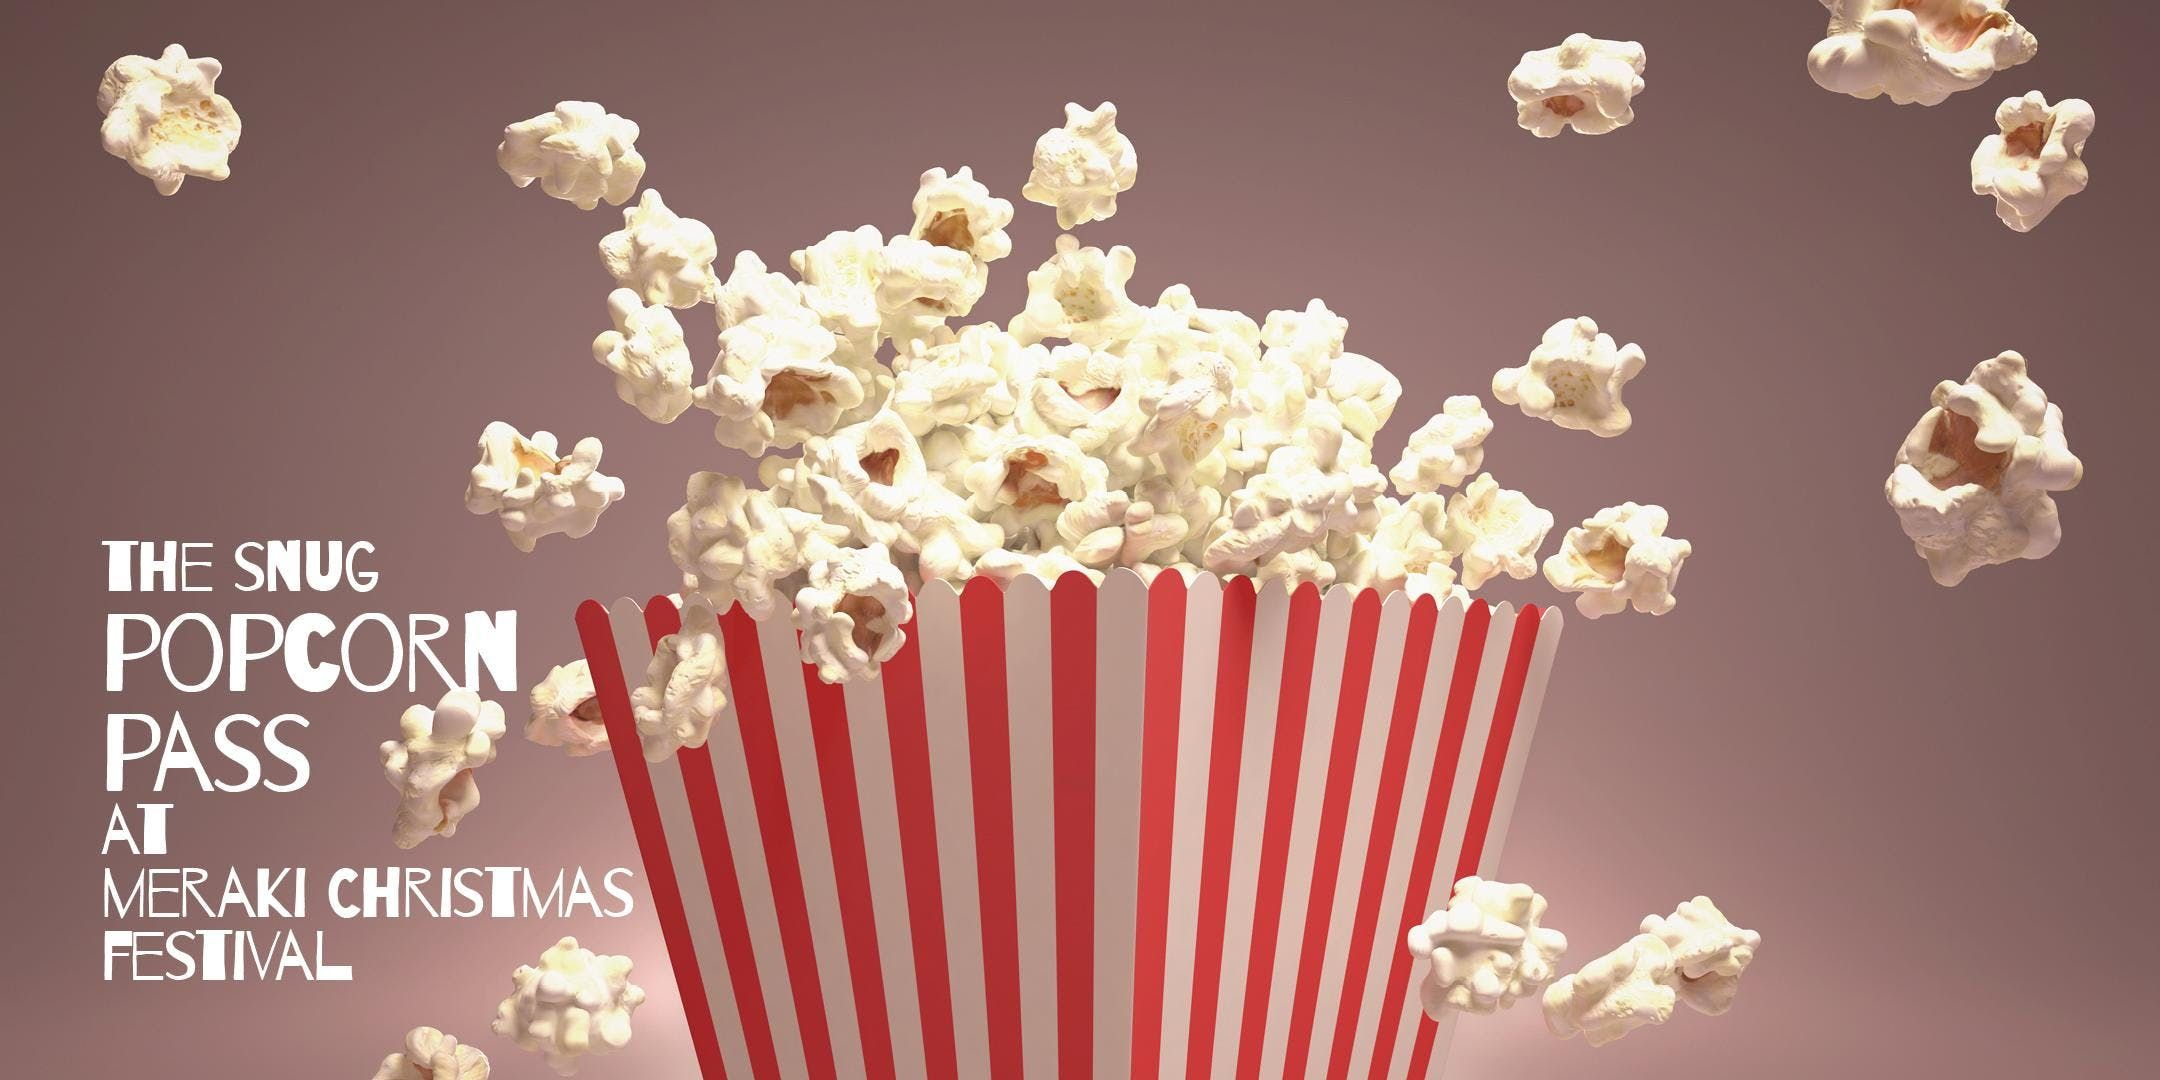 The Snug Popcorn Pass Tuesday 11 Dec